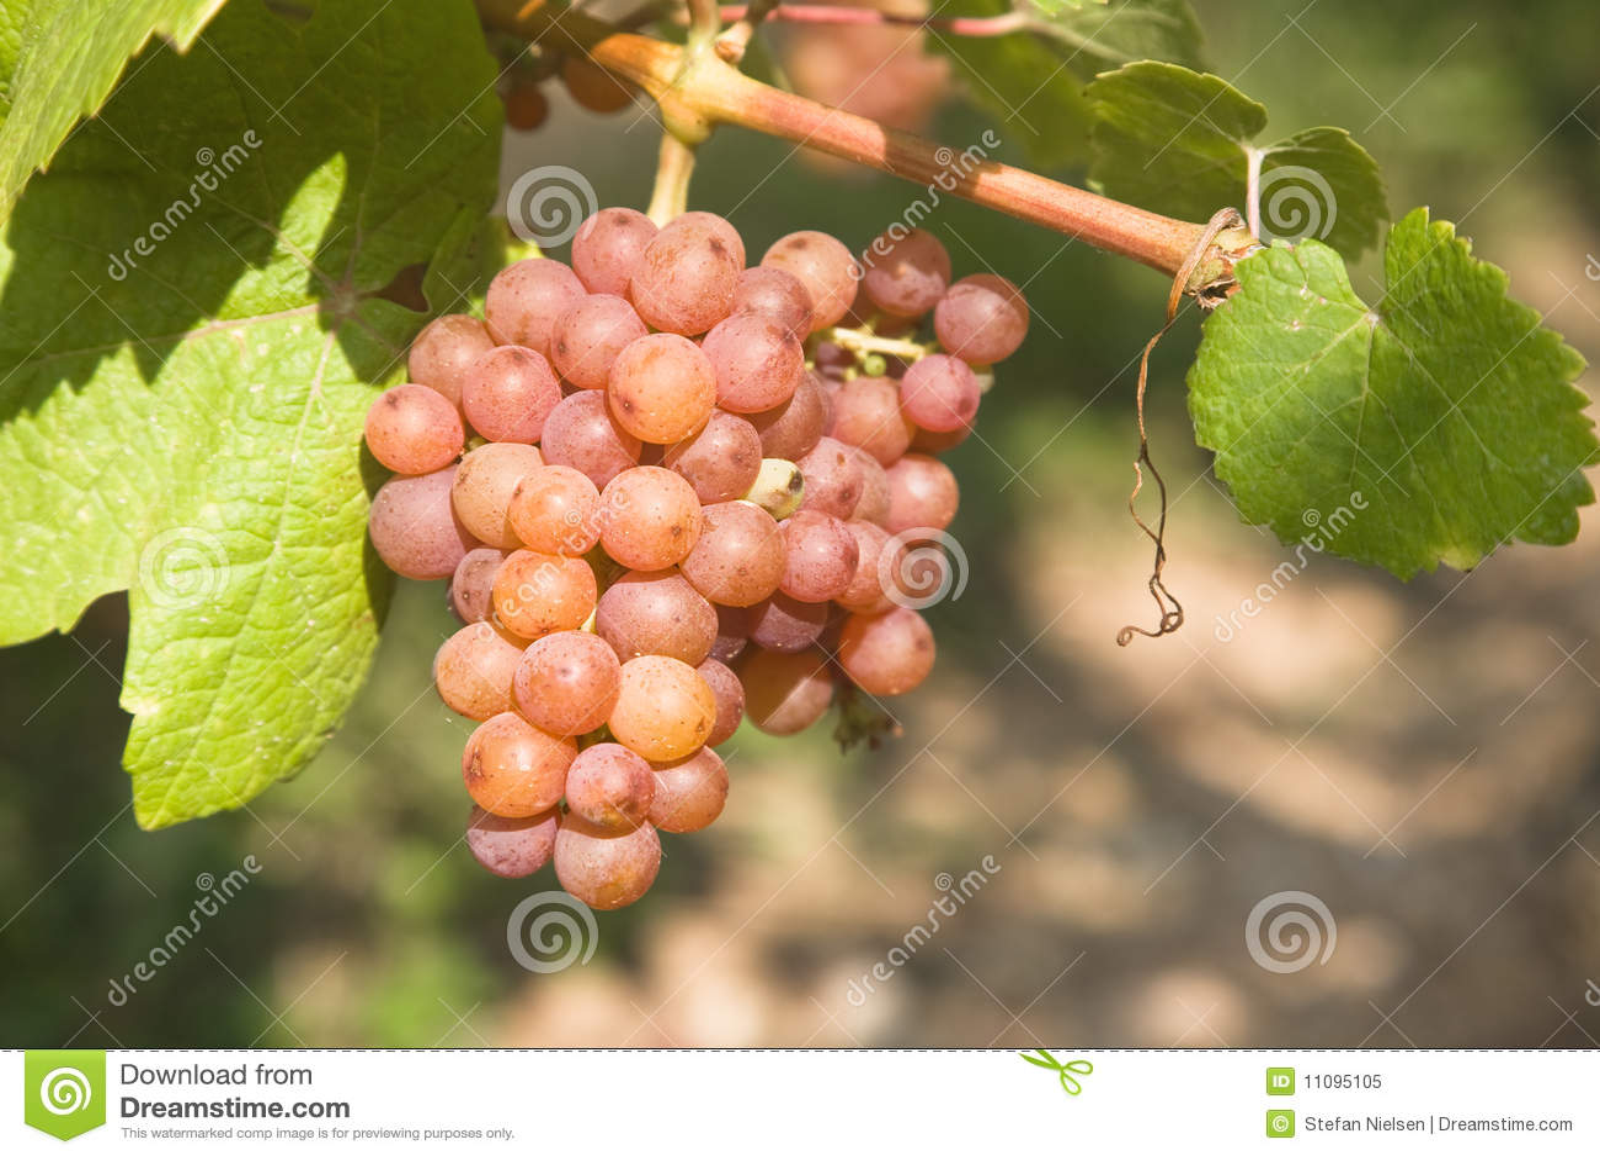 Uvas listas para la cosecha